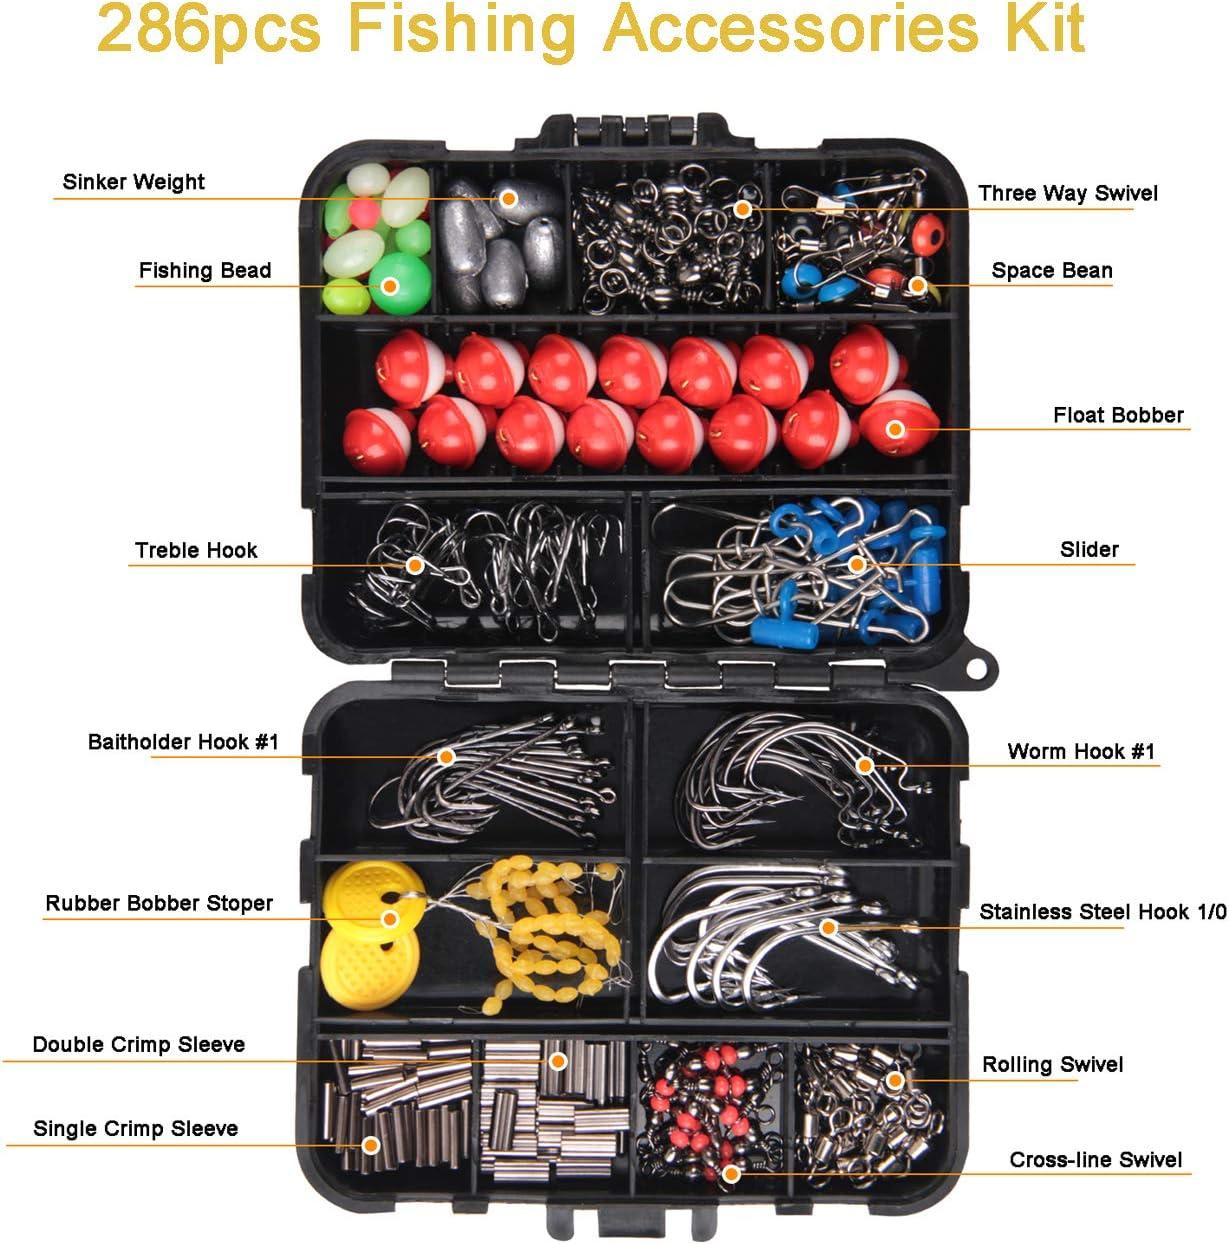 JSHANMEI Fishing Accessories Tackle Kit - Fishing Hooks, Swivel Snap, Sinker Weight, Fishing Beads, 3WaySwivelFishing for Freshwater Saltwater Terminal Tackle Box (286PCS) : Sports & Outdoors